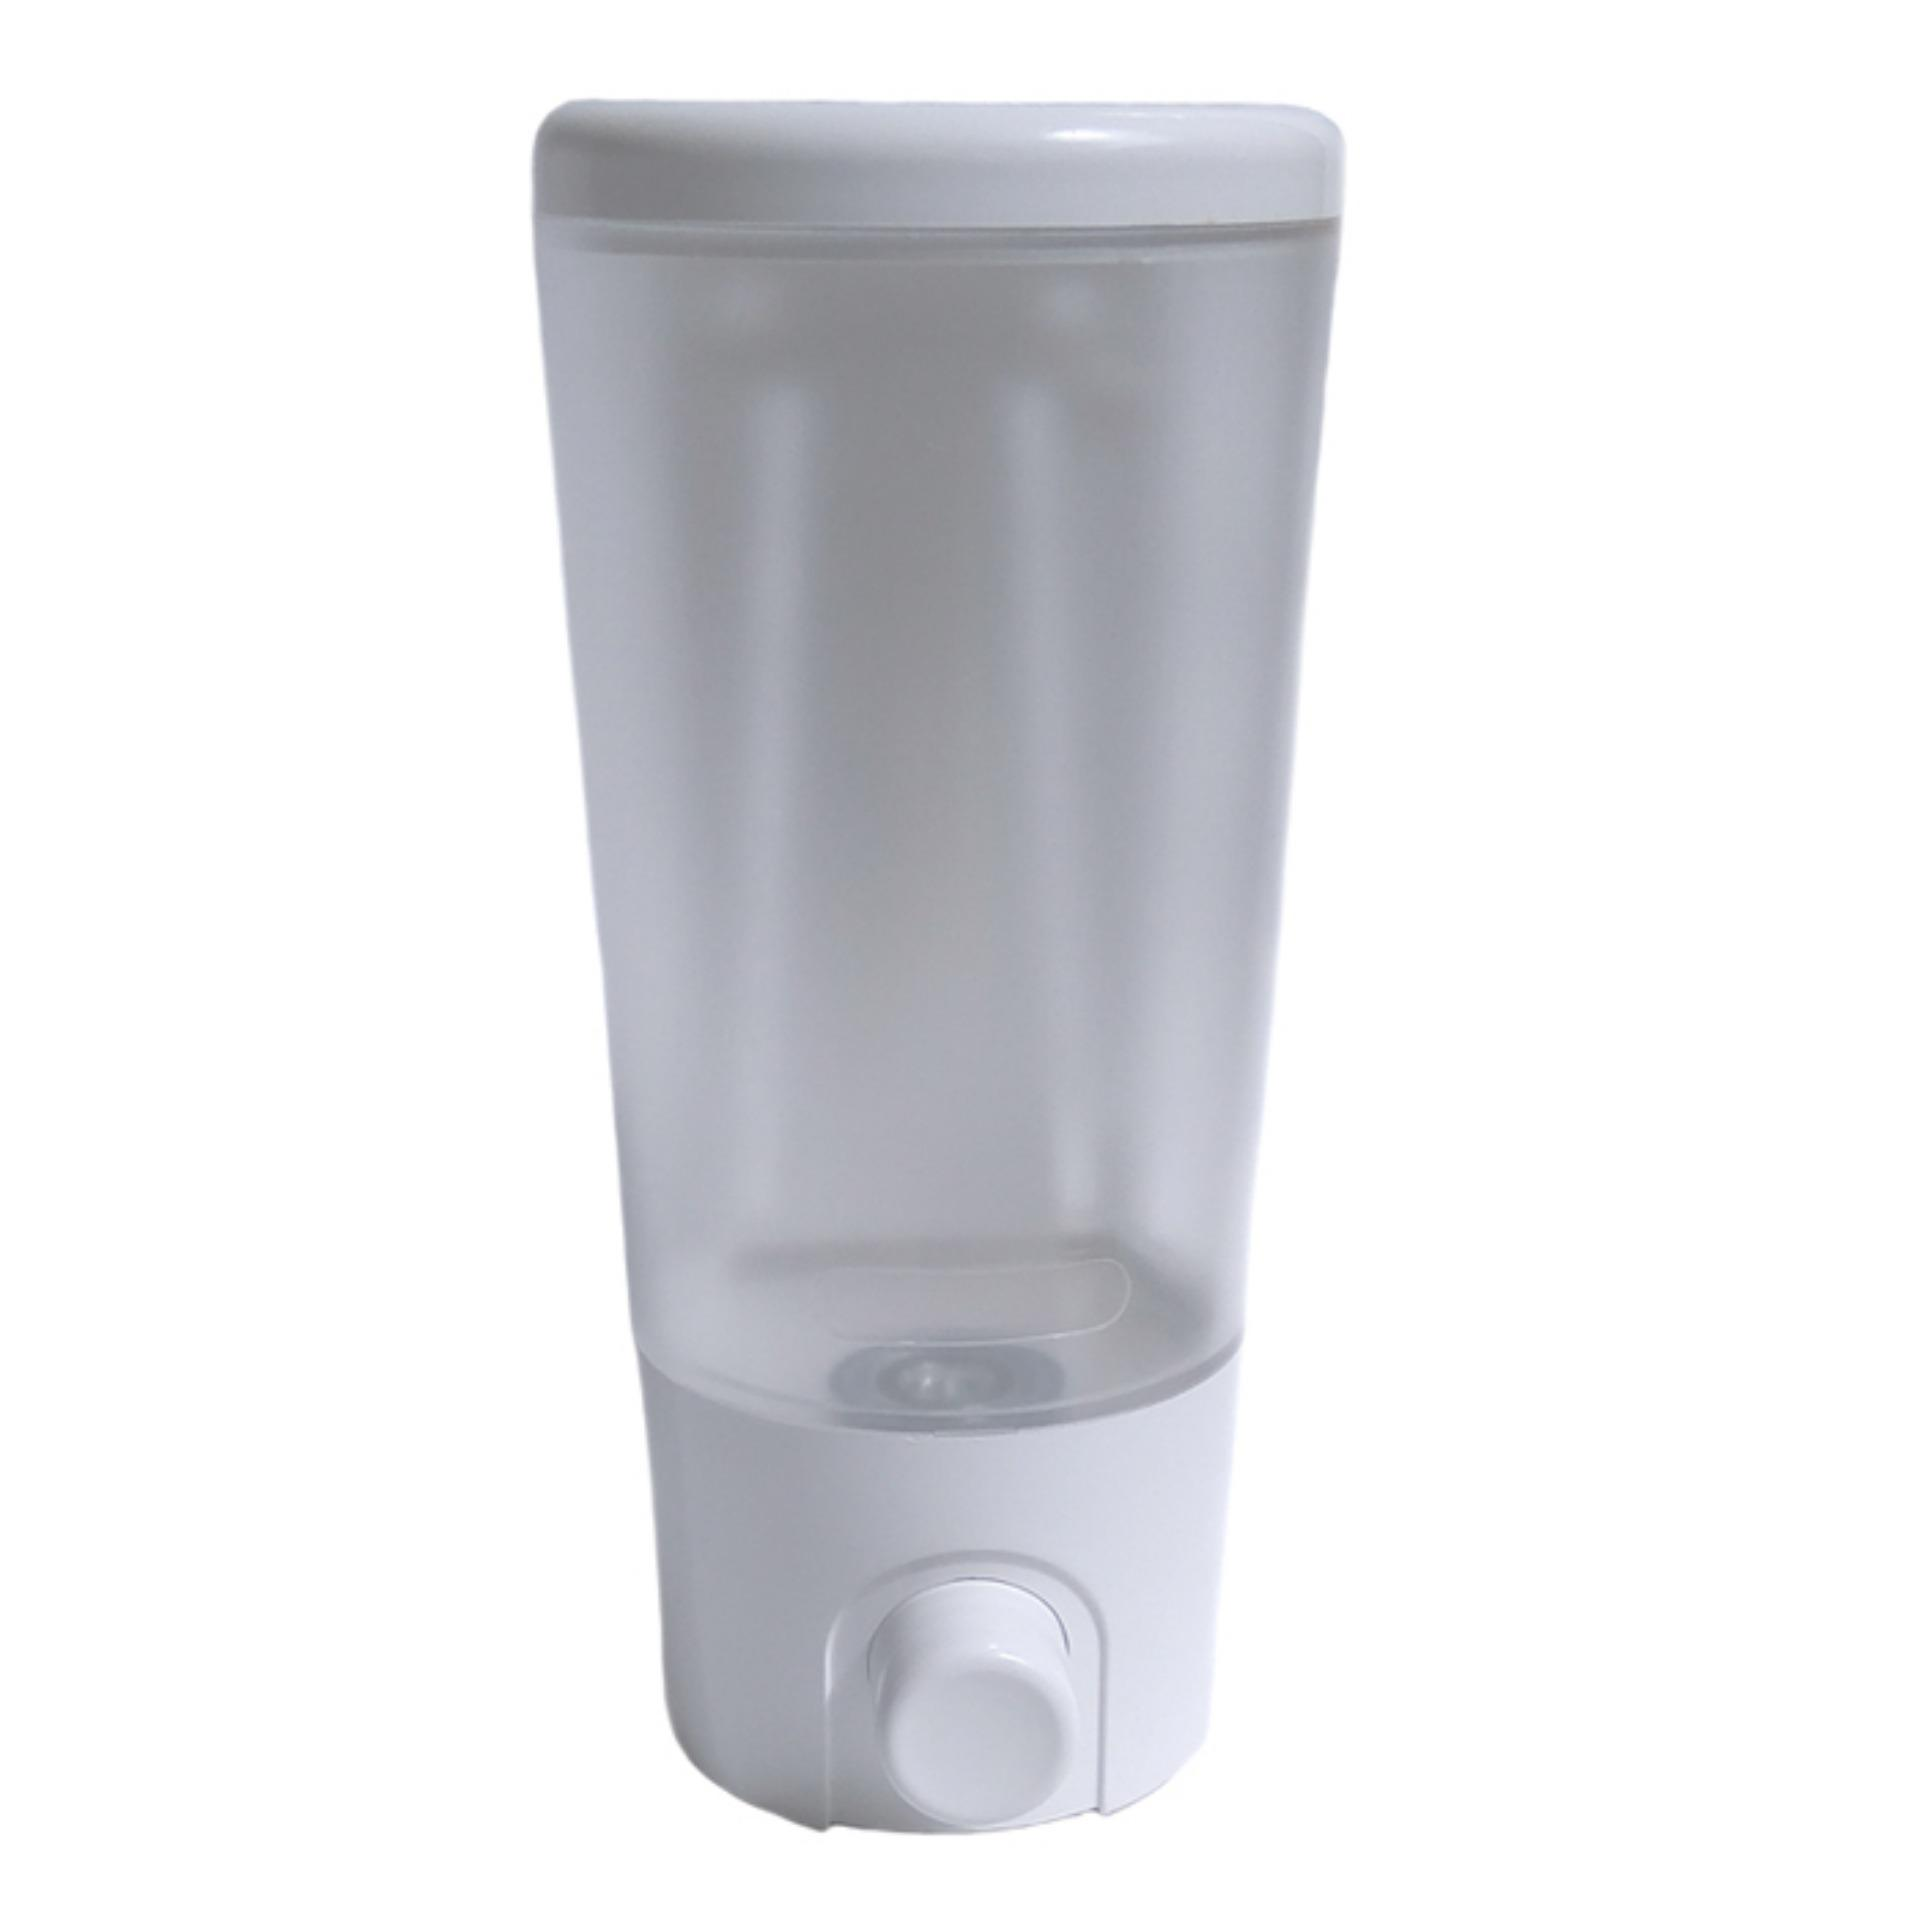 Tigaduasatu Dispenser Sabun Cair Tabung Touch Soap Dispenser - Putih